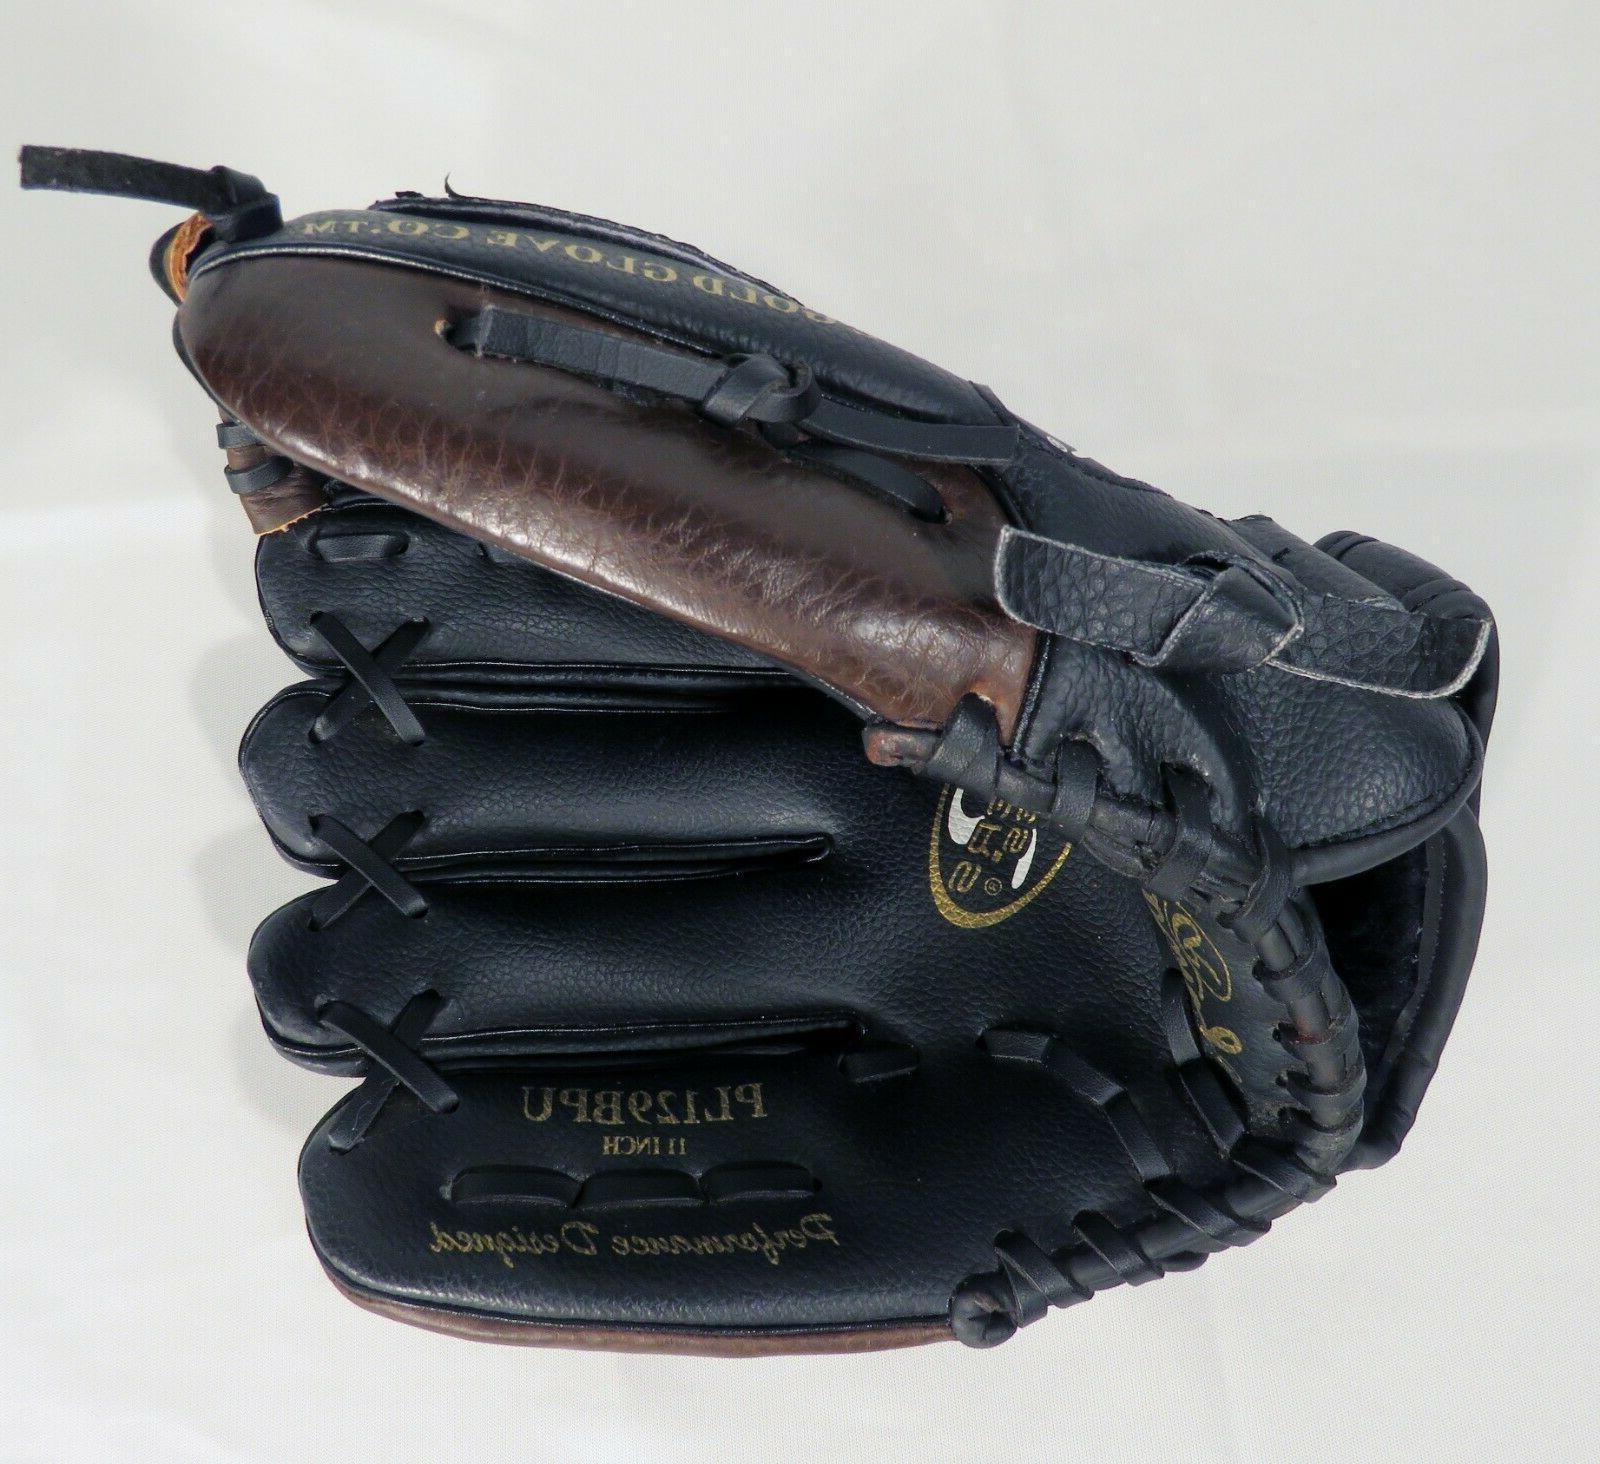 "RAWLINGS Players PL129BPU 11"" Baseball Glove Mitt Right Hand"